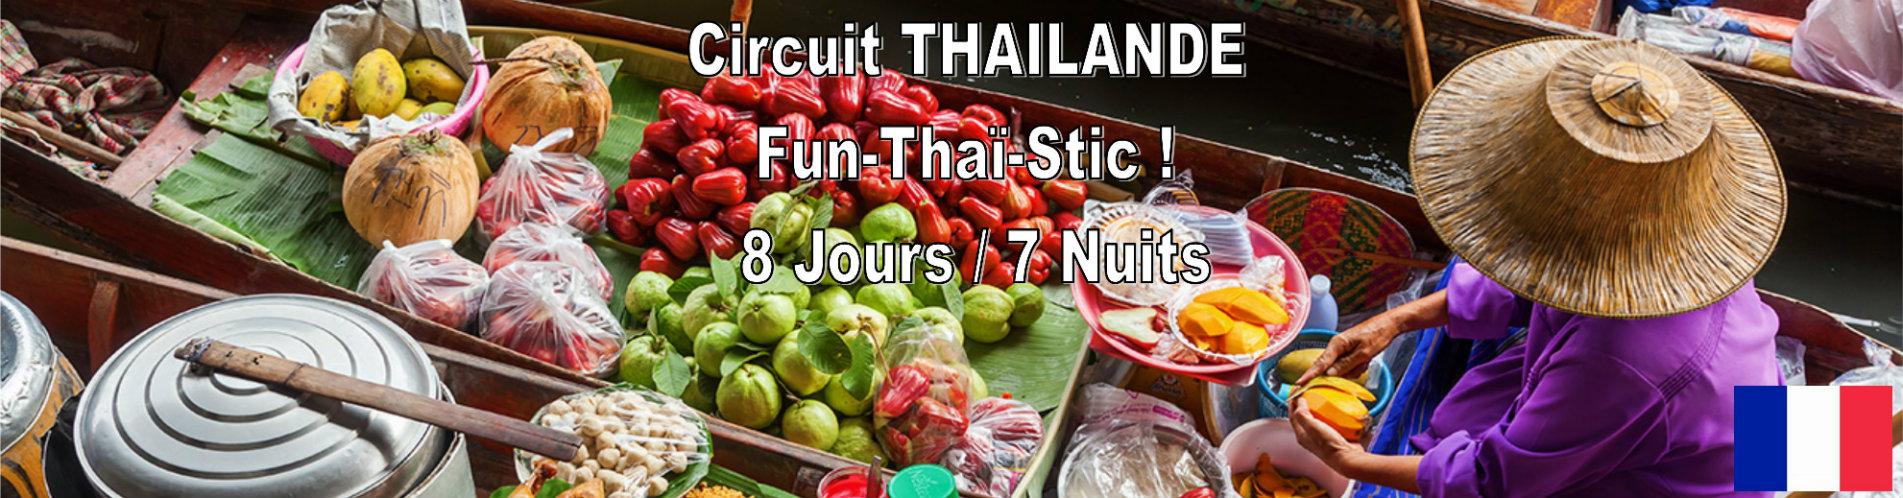 Tour Thailande